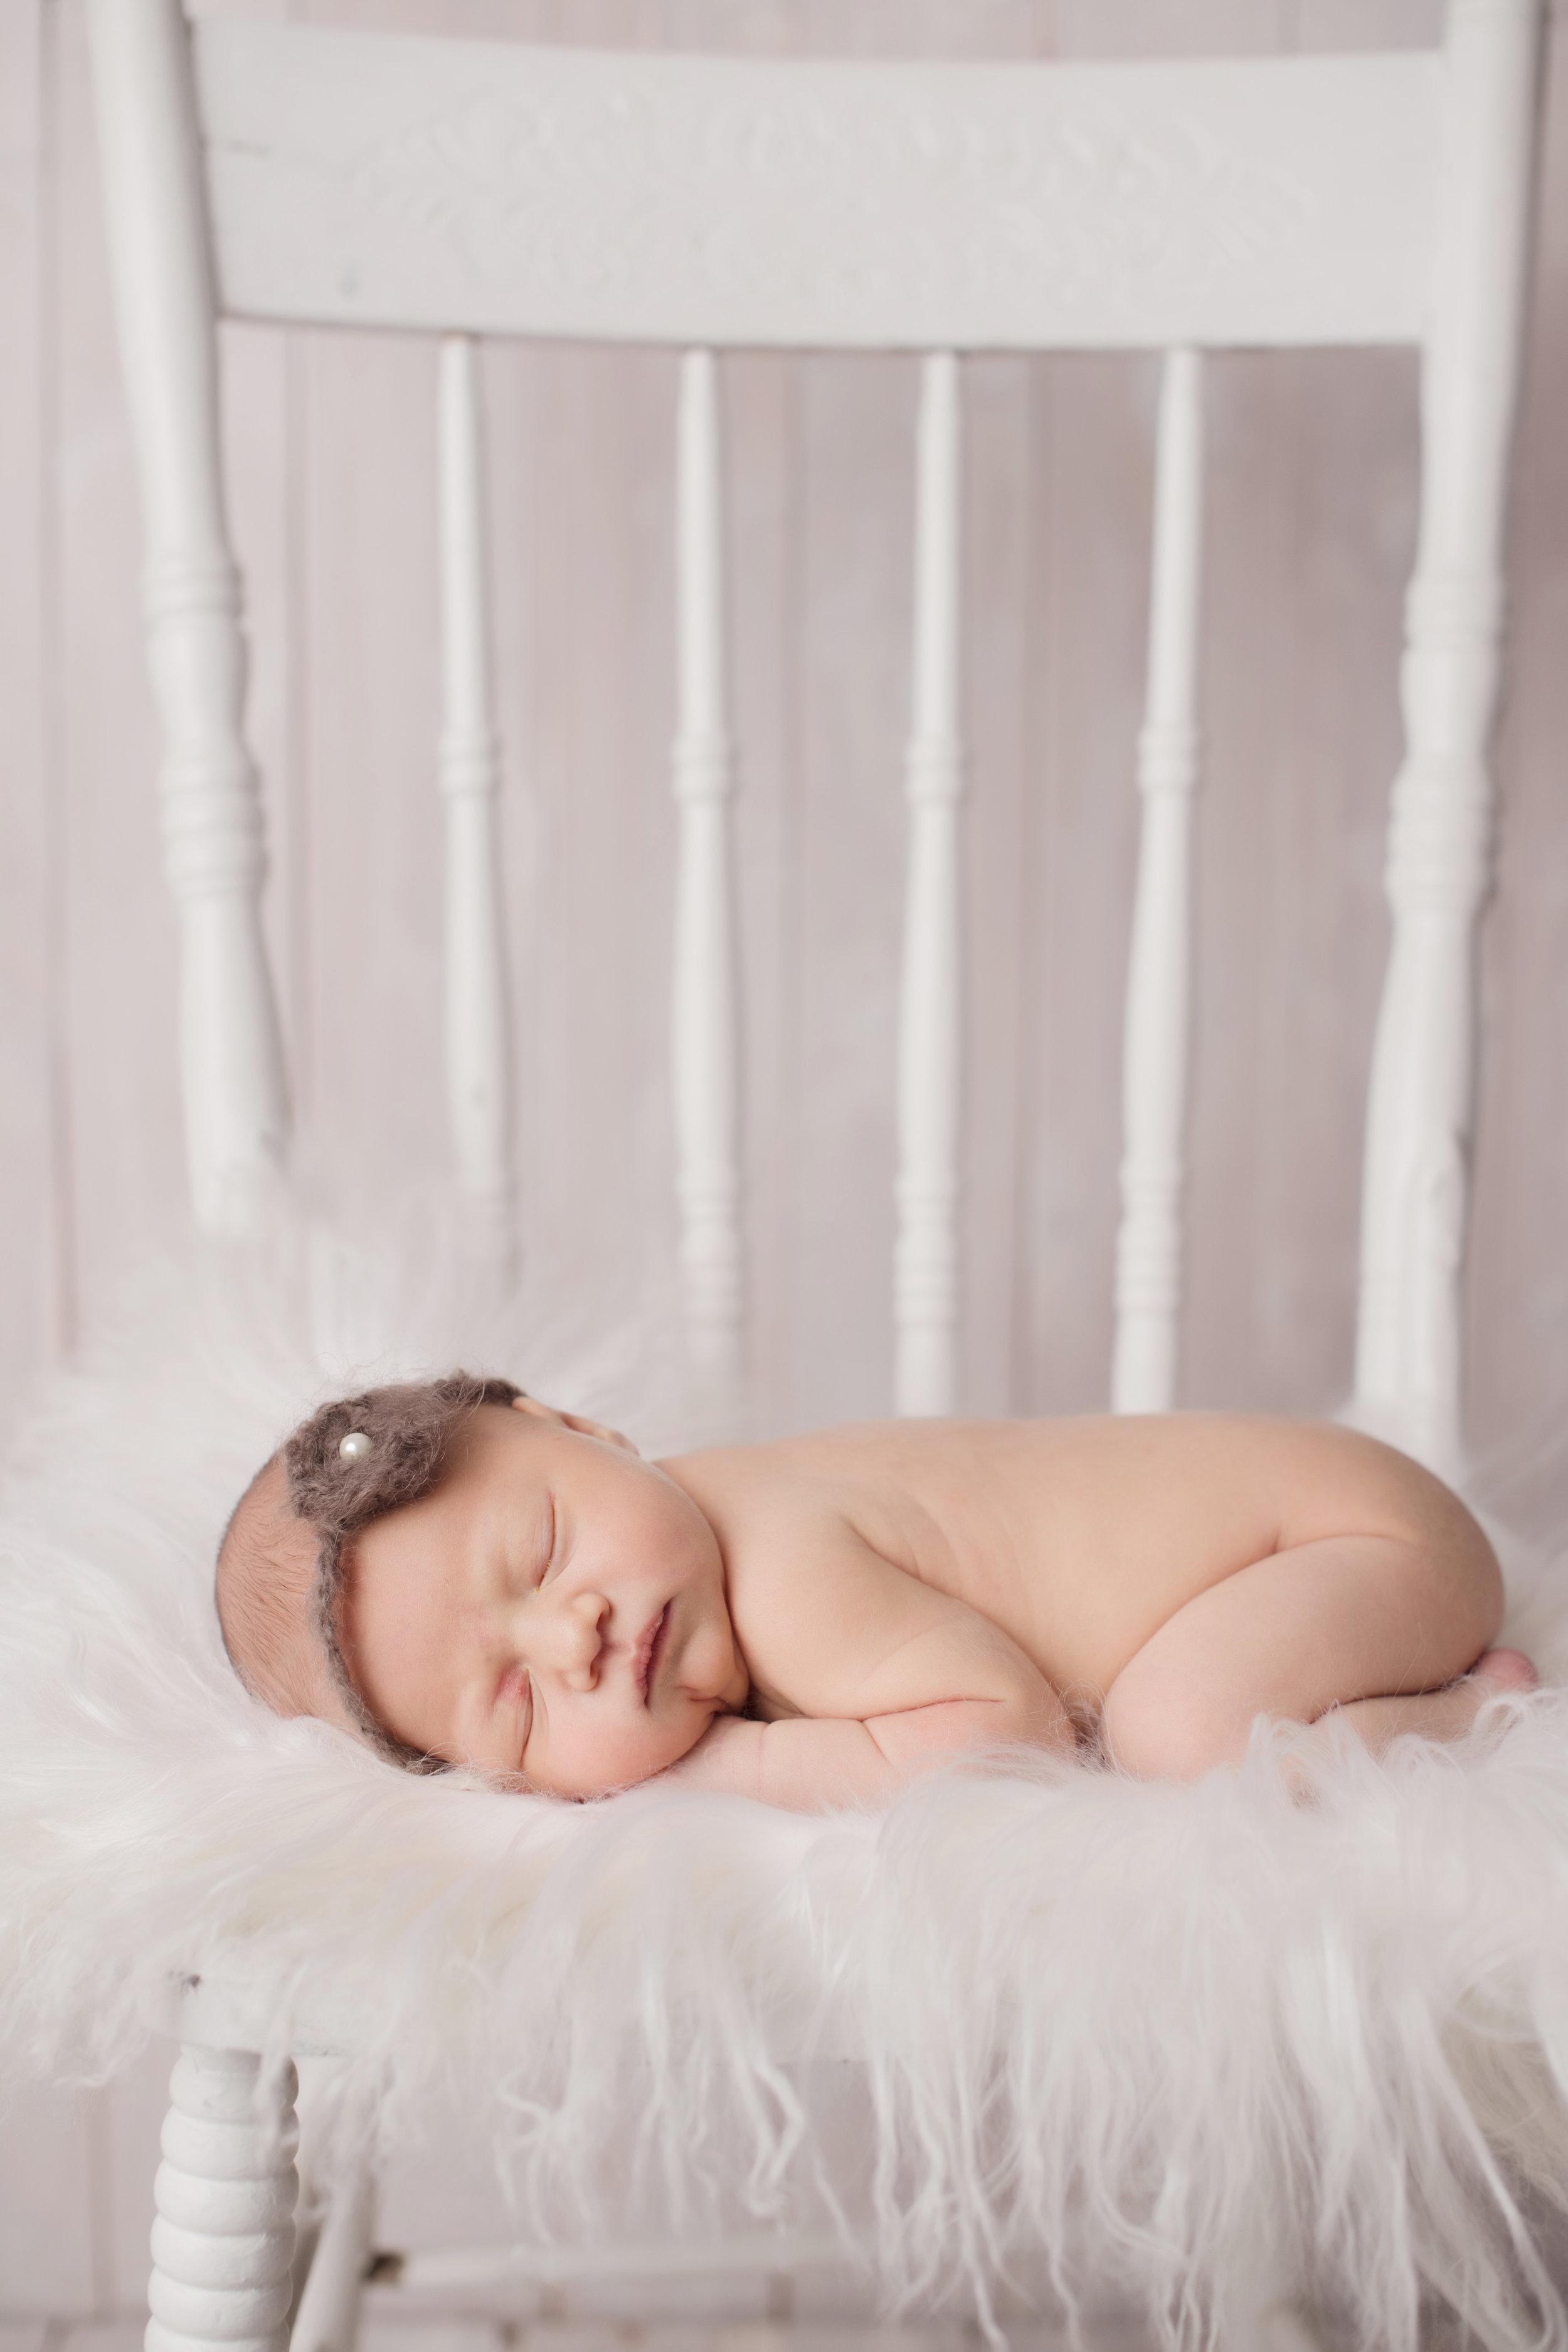 Baby-Photographer-Newborn-Photography-Bozeman-Billings-Montana-Tina-Stinson-Photography-2447.jpg